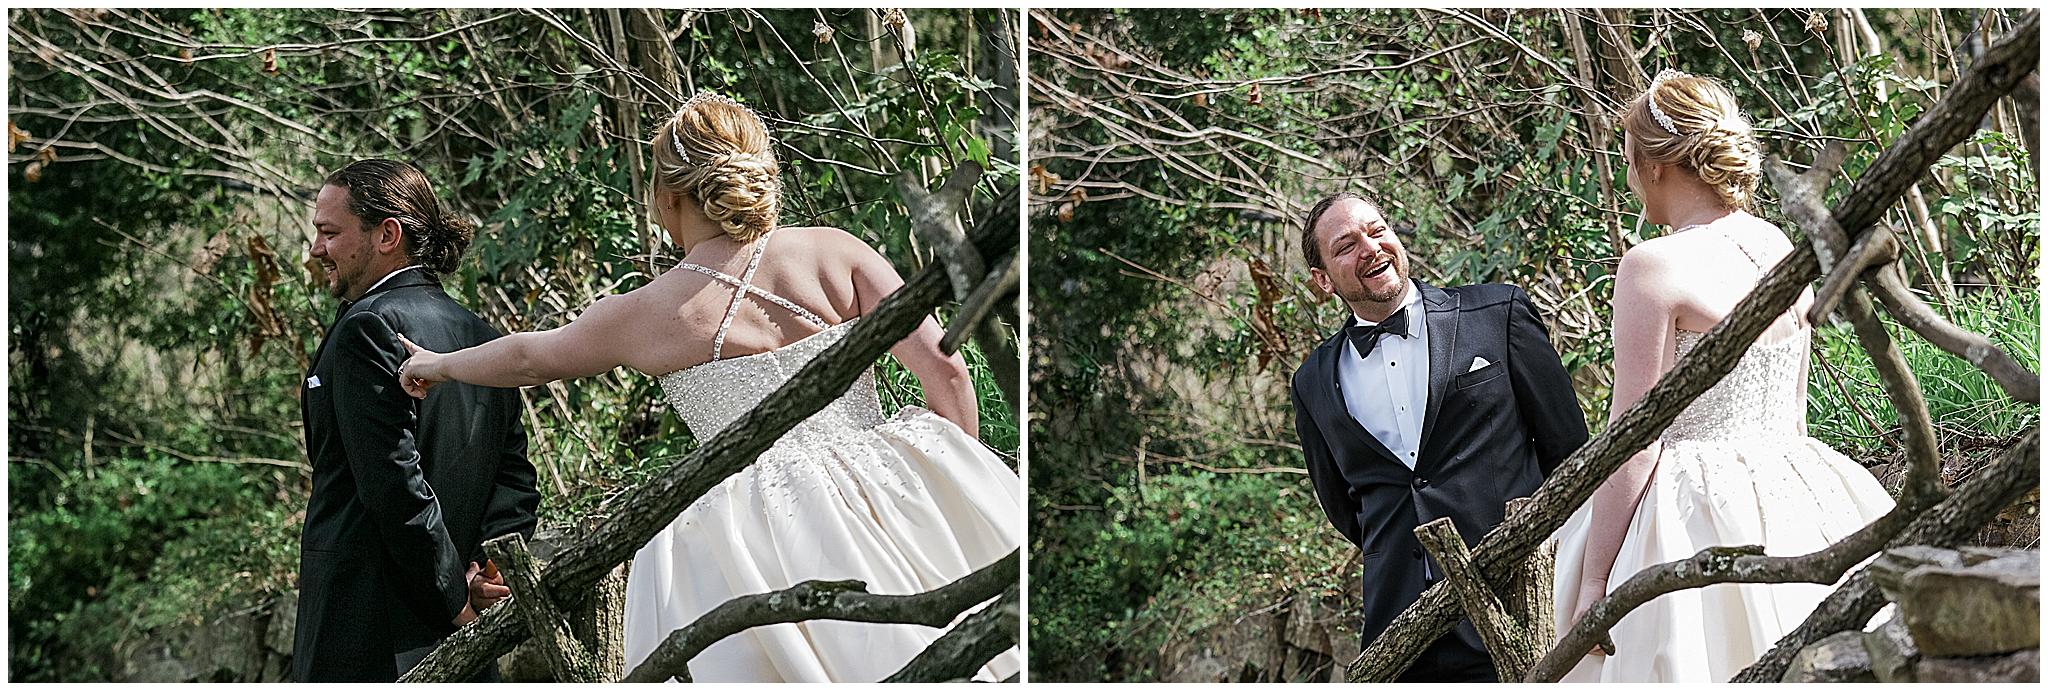 Wedding_Photographers_Asheville_Mountain_Magnolia_Inn_0010.jpg